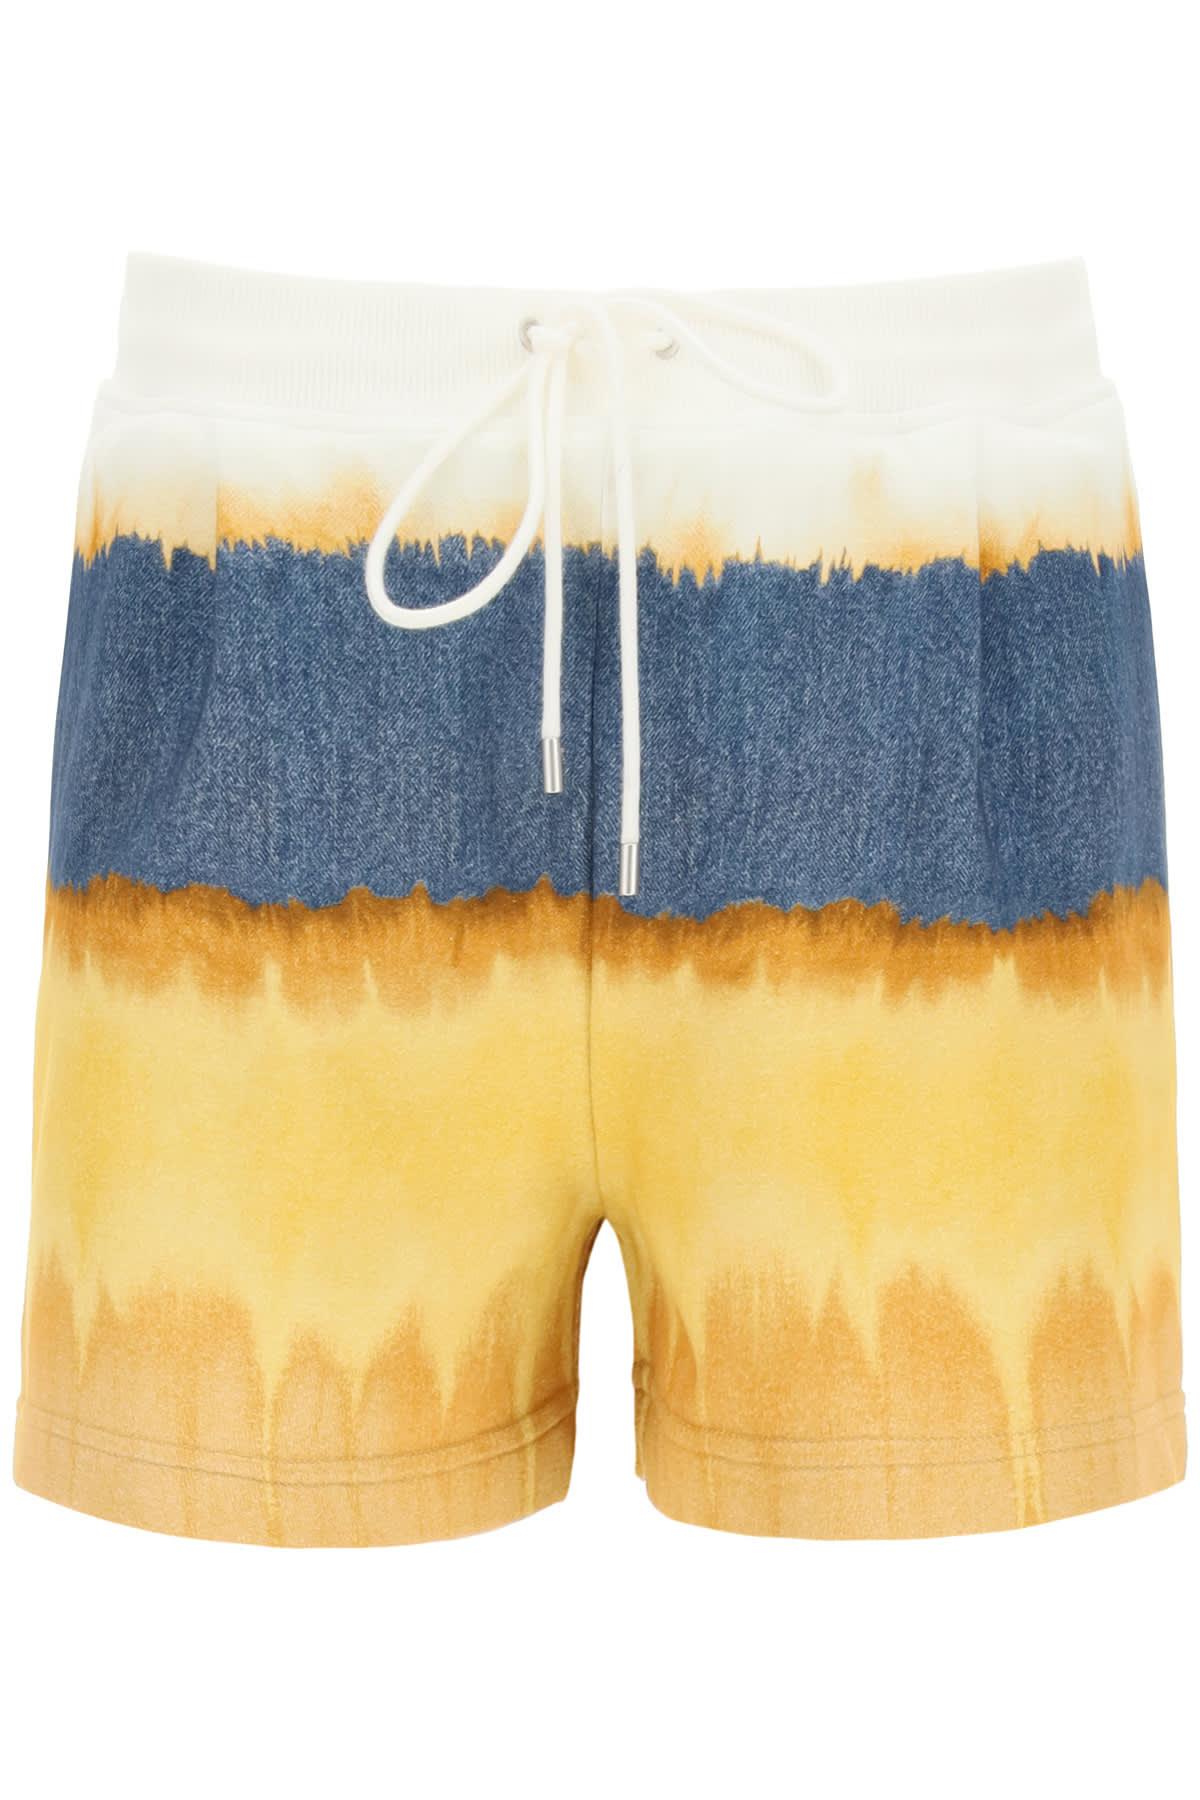 Alberta Ferretti Shorts I LOVE SUMMER TIE-DYE JERSEY SHORTS